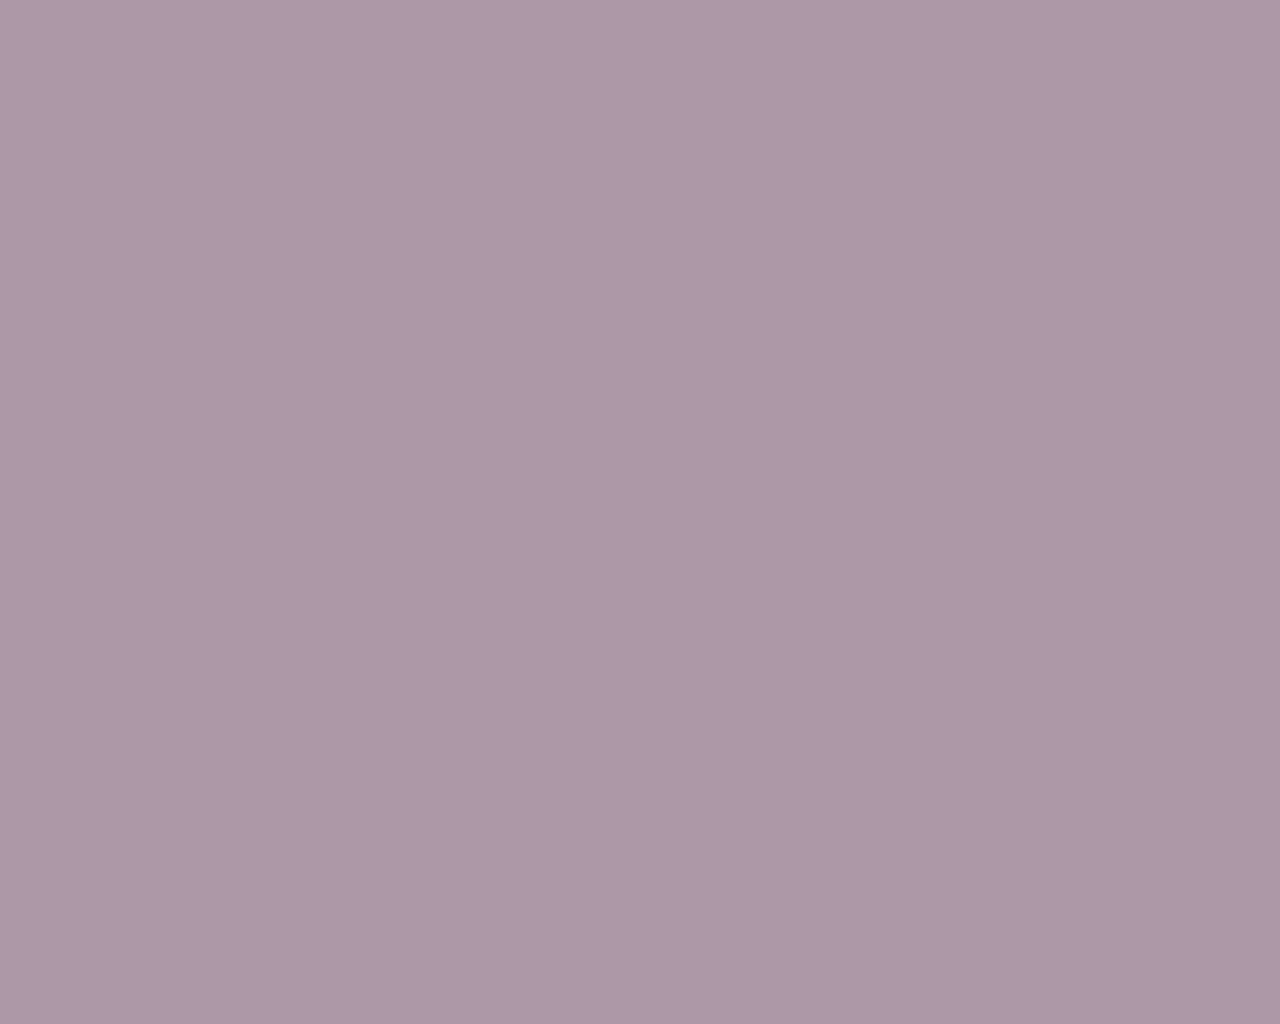 1280x1024 Rose Quartz Solid Color Background